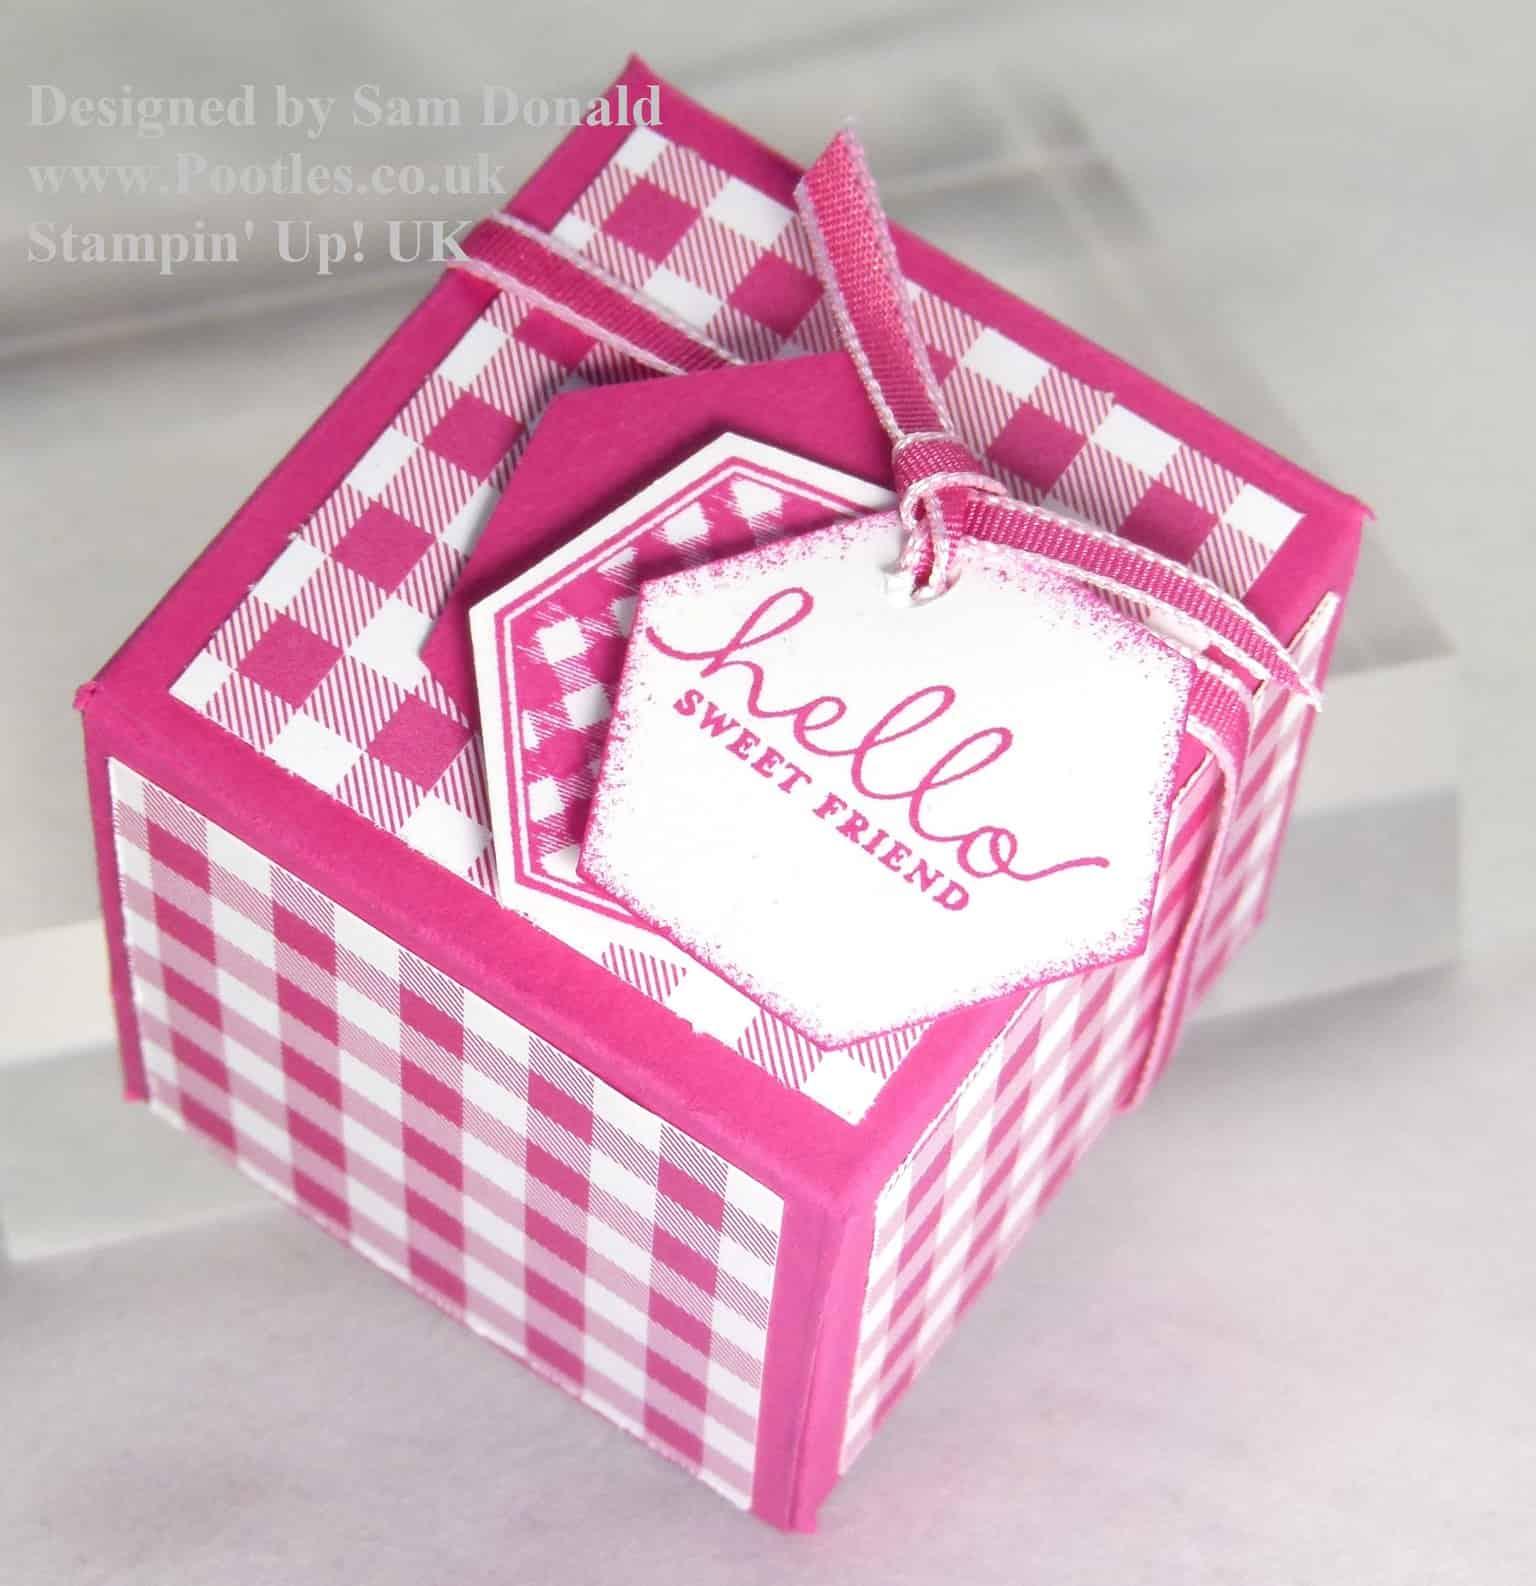 Pootles Stampin Up UK 2x2x2 Cube Fold Flat Favour Box